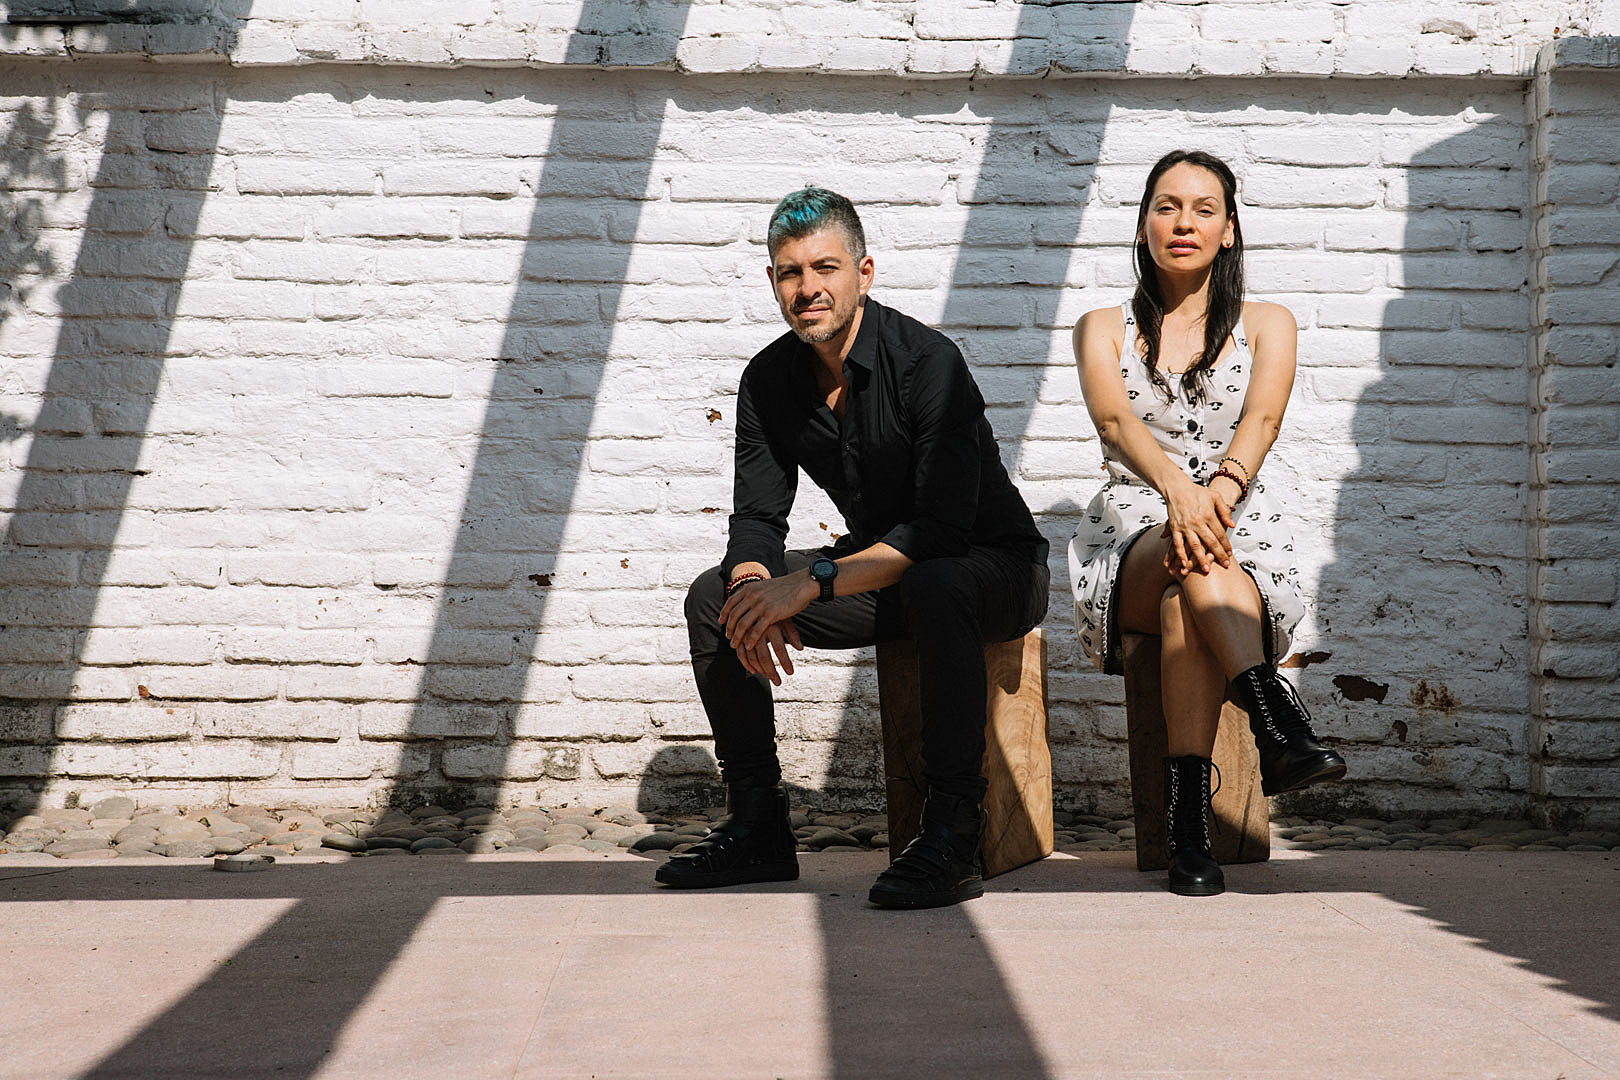 Rodrigo y Gabriela Release Unplugged Cover of Metallica's 'Battery'